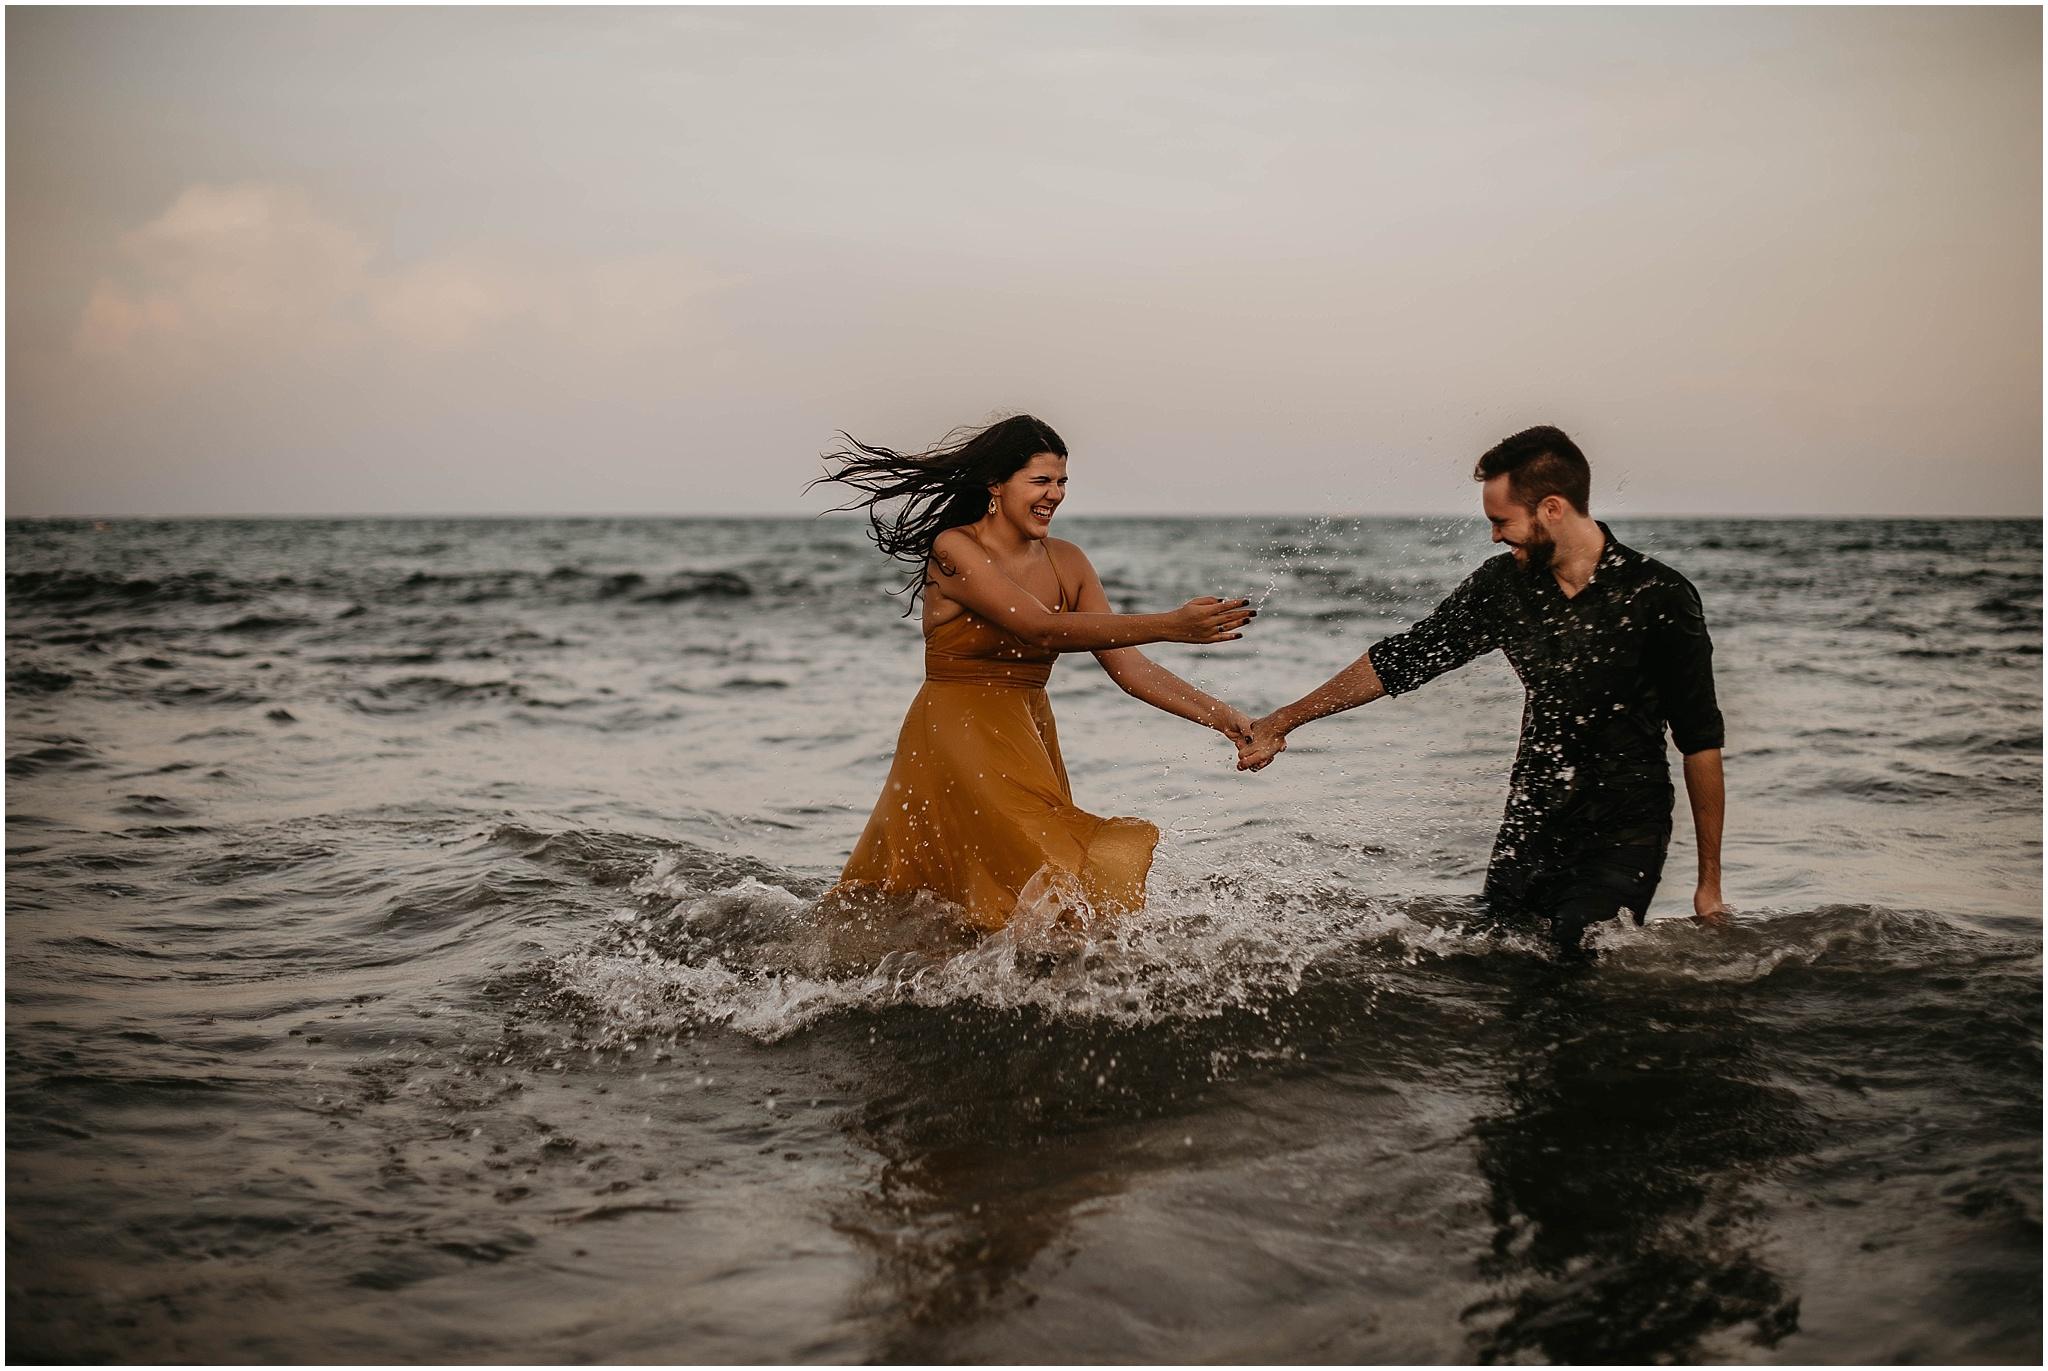 Worth-Avenue-Palm-Beach-engagement-photographer_0041.jpg